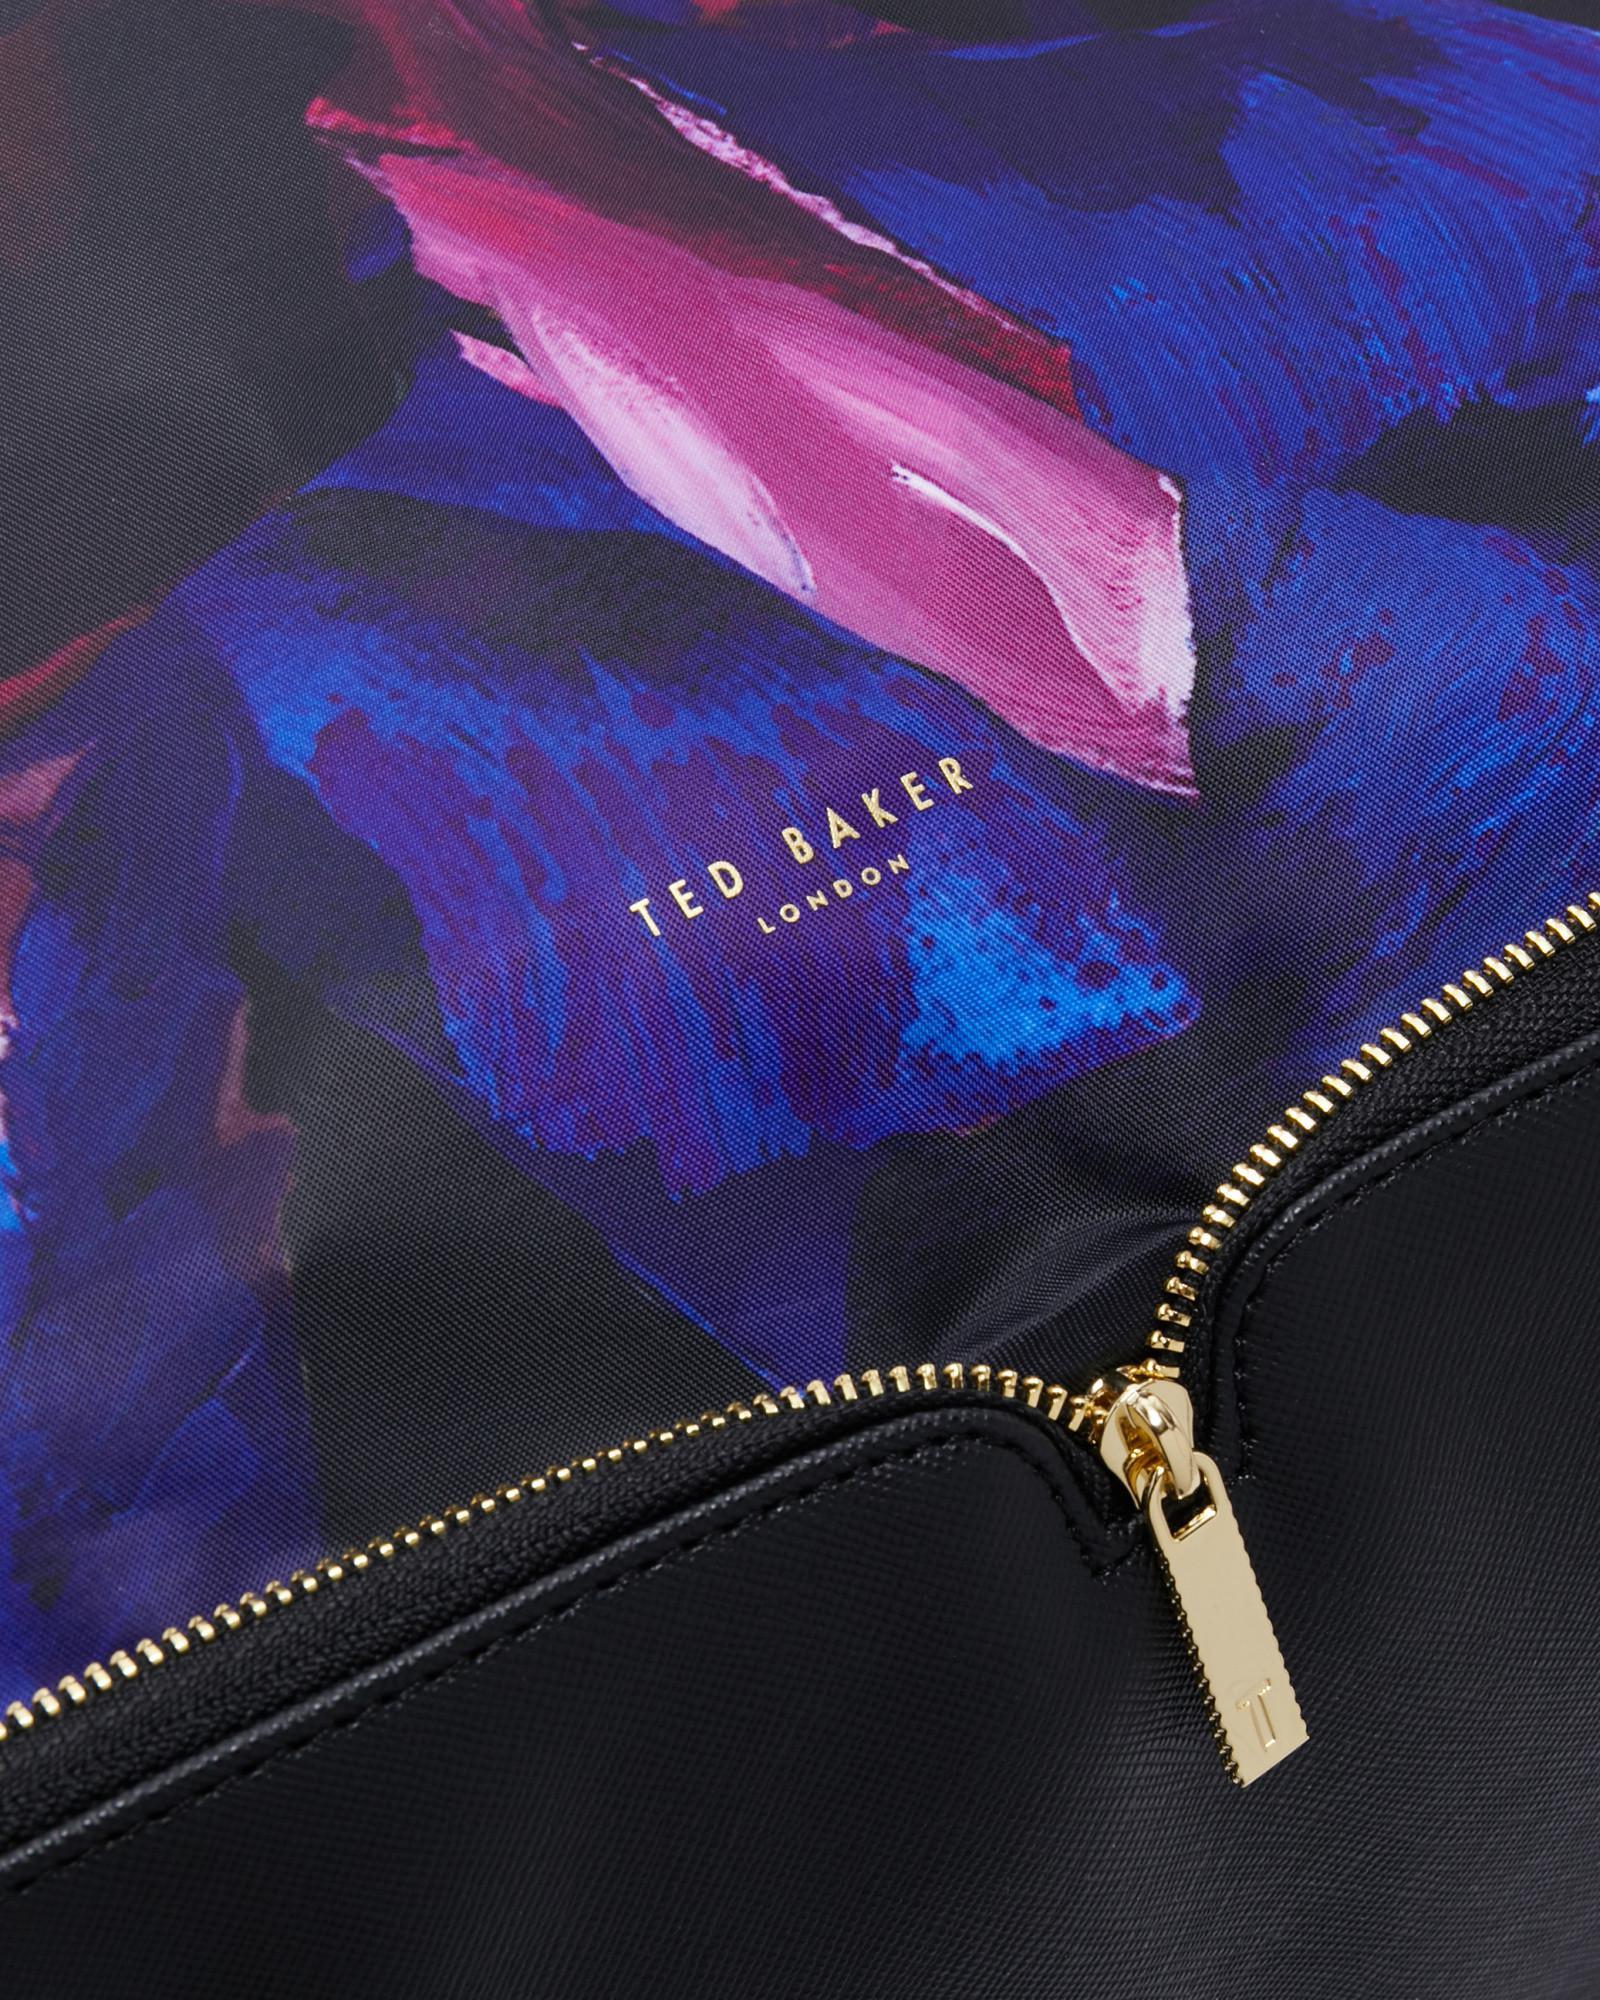 c1f6c440bbcec0 Ted Baker Impressionist Bloom Foldaway Shopper Bag in Black - Lyst